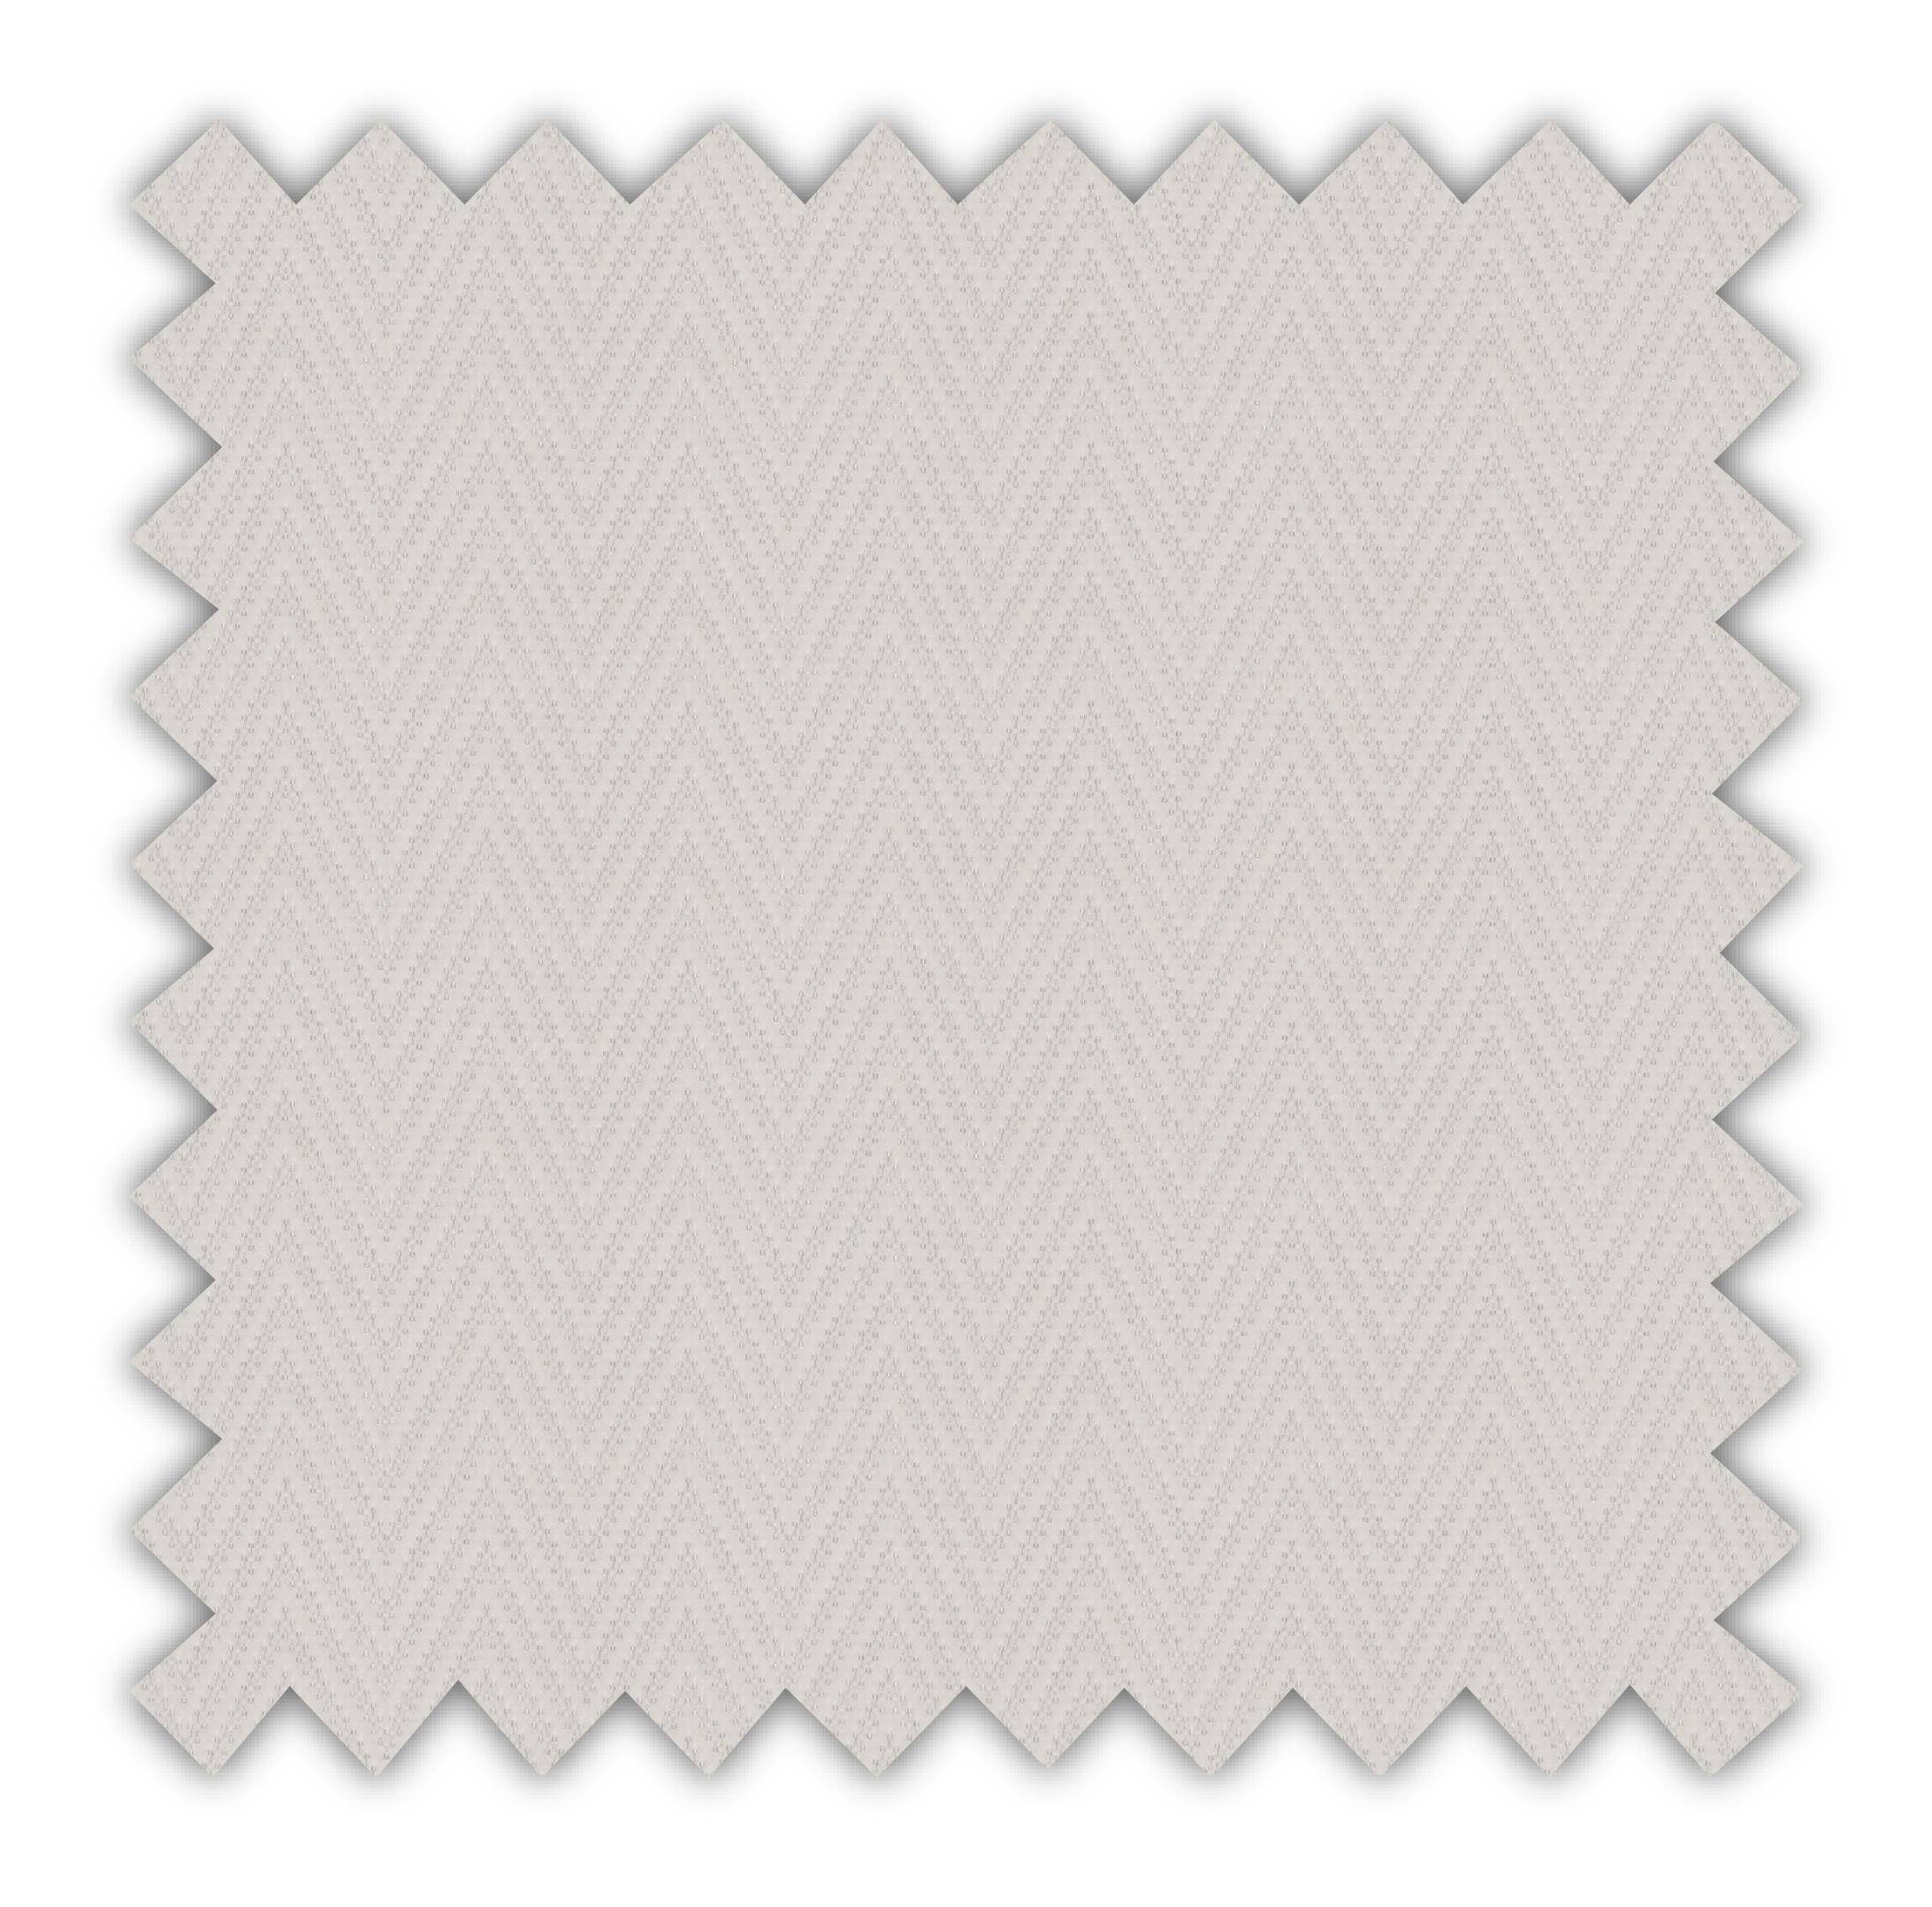 mobius-linen-roman-blinds-swatch